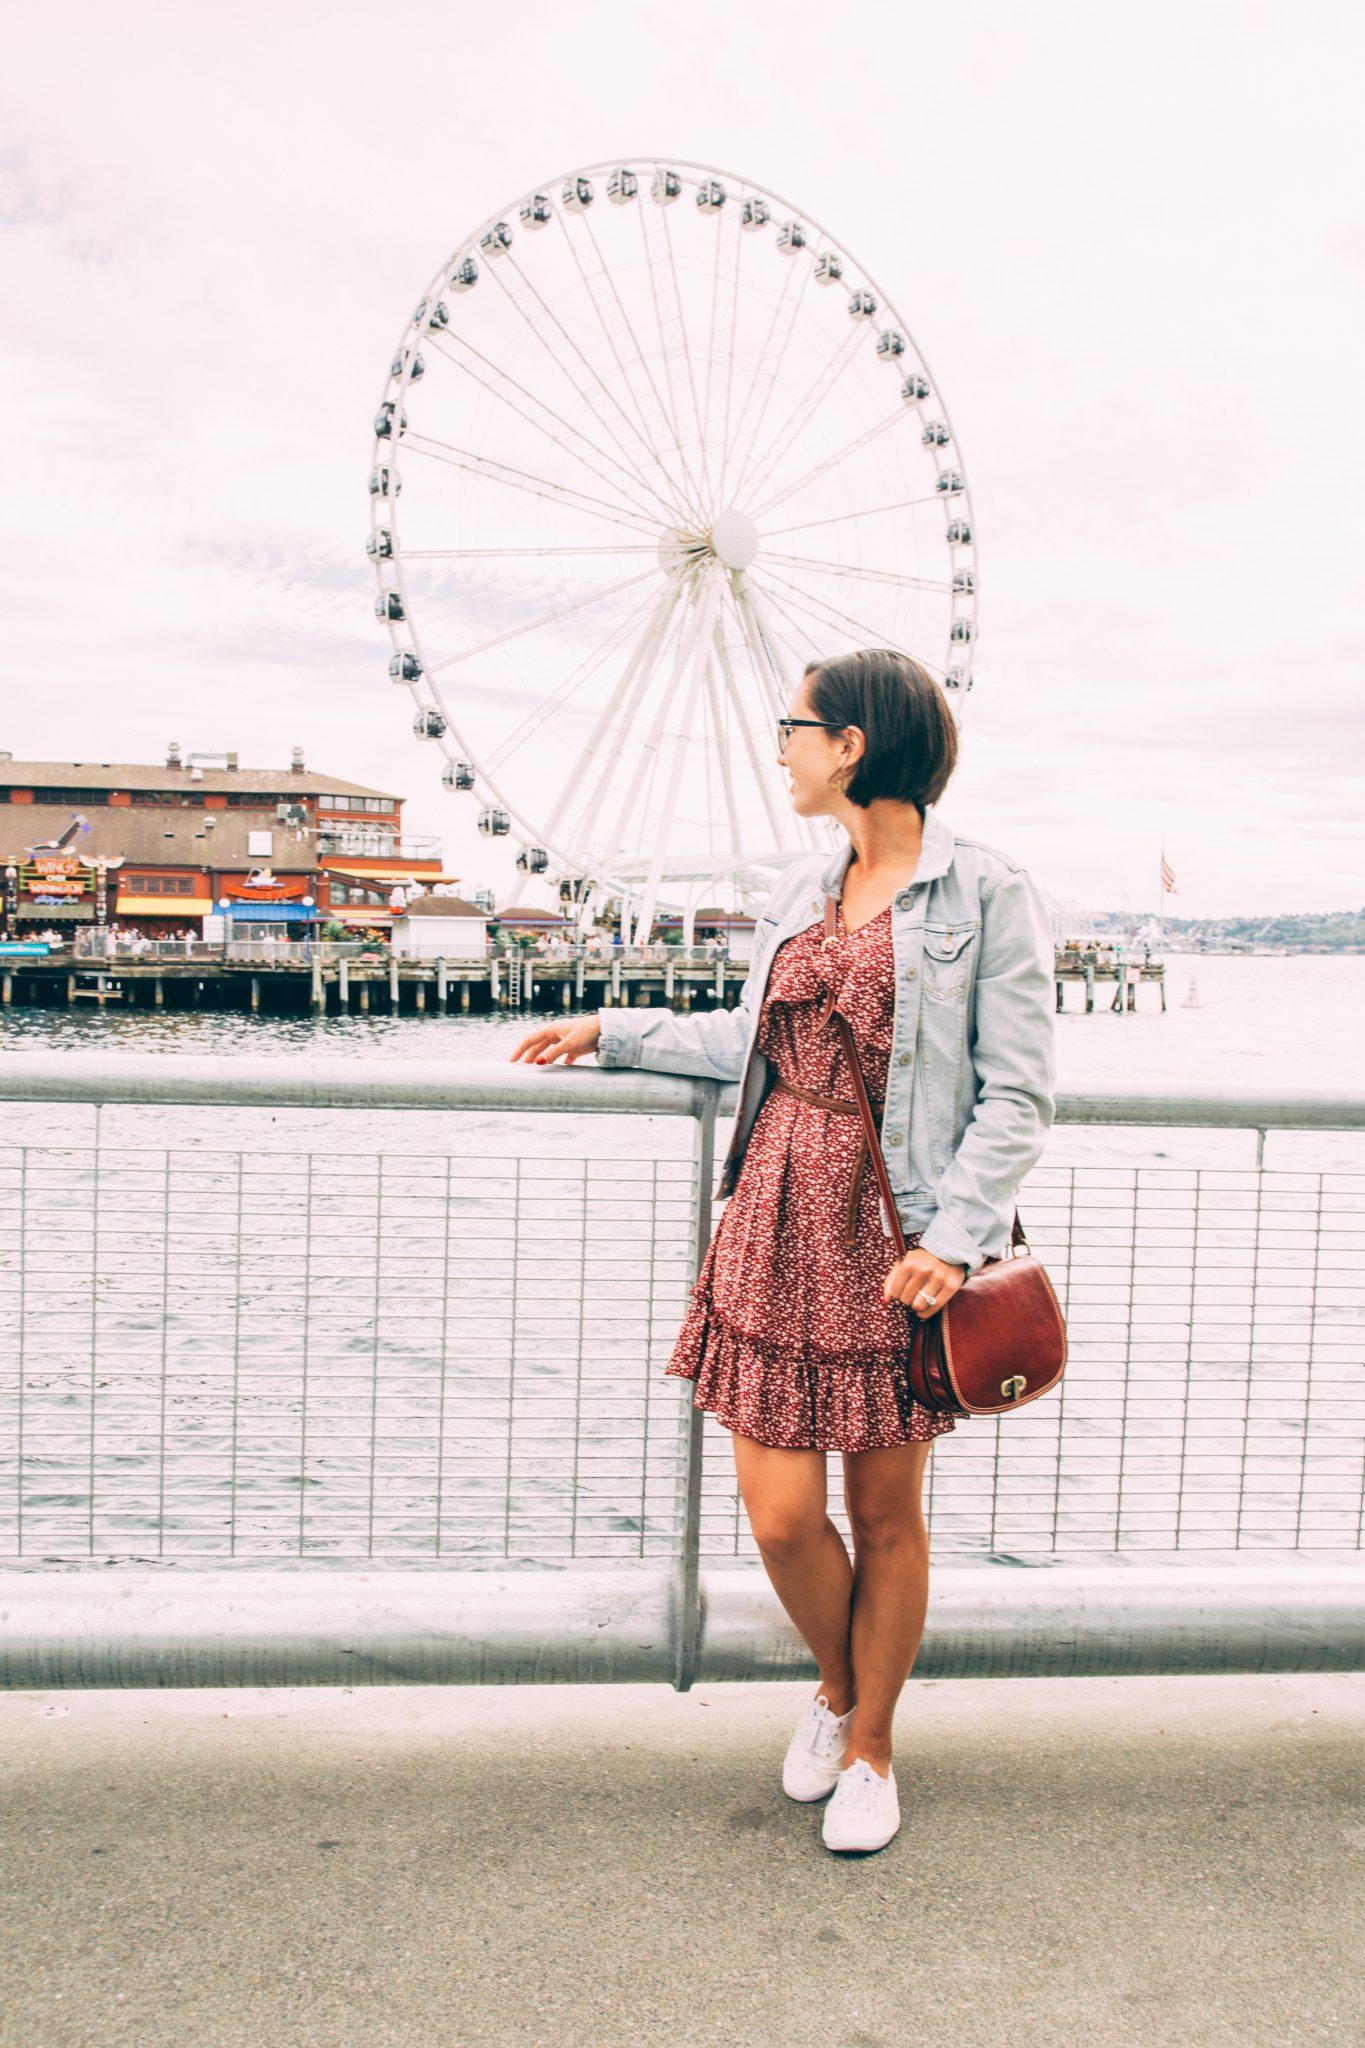 My Experience Ordering From Amoretu (Dresses, Shirts & Pajamas)